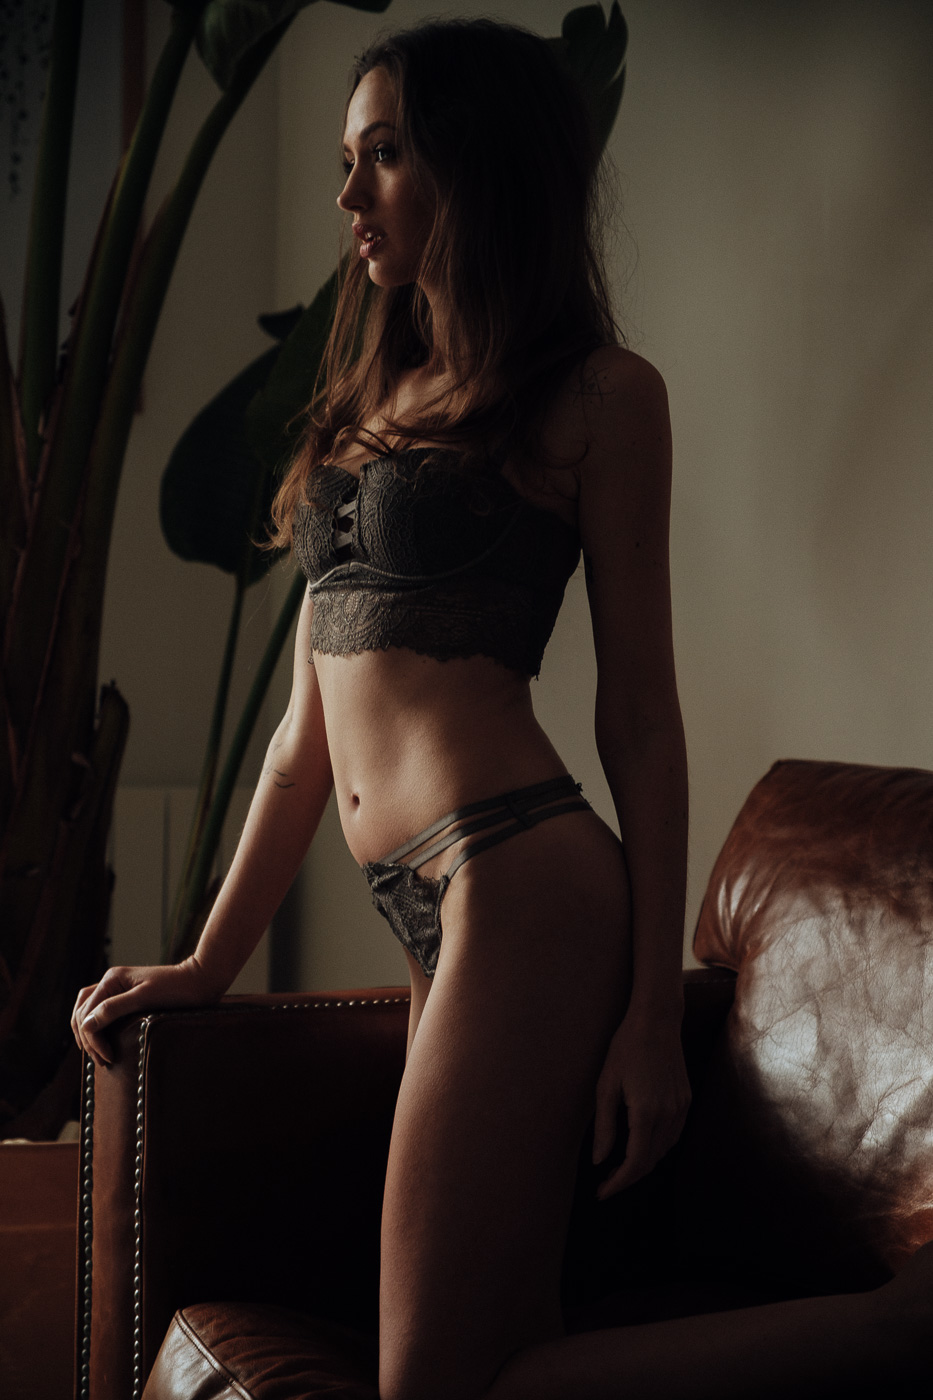 Laura BGN